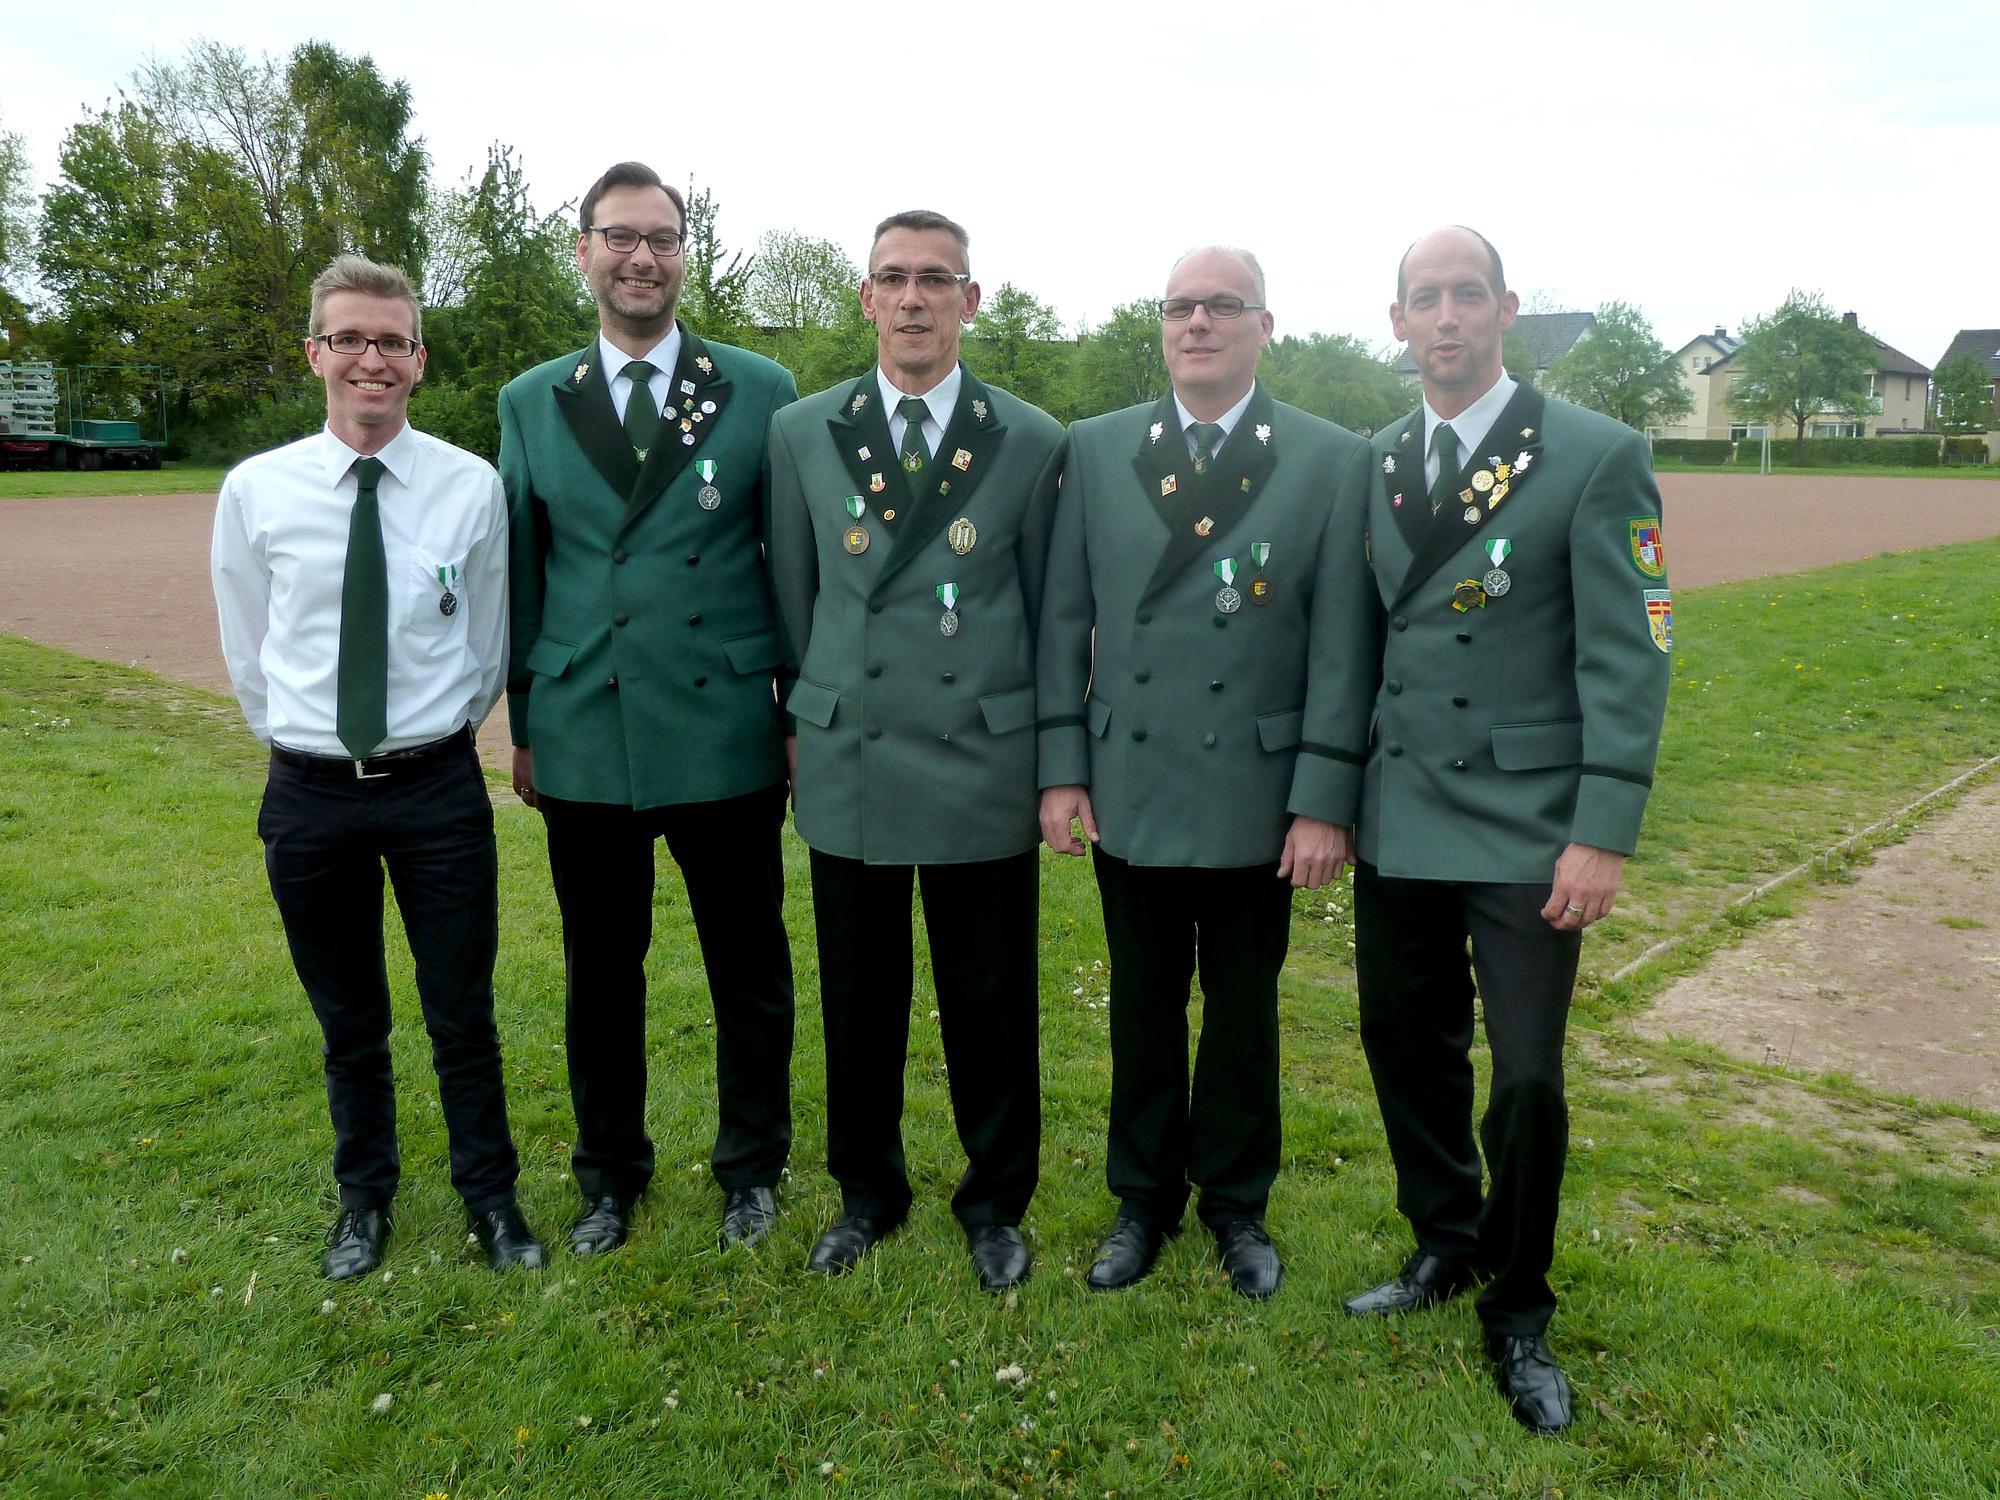 Udo Sill, Markus van Wesel, Michael Blömeke, Manfred Sieveke, Marc Lange